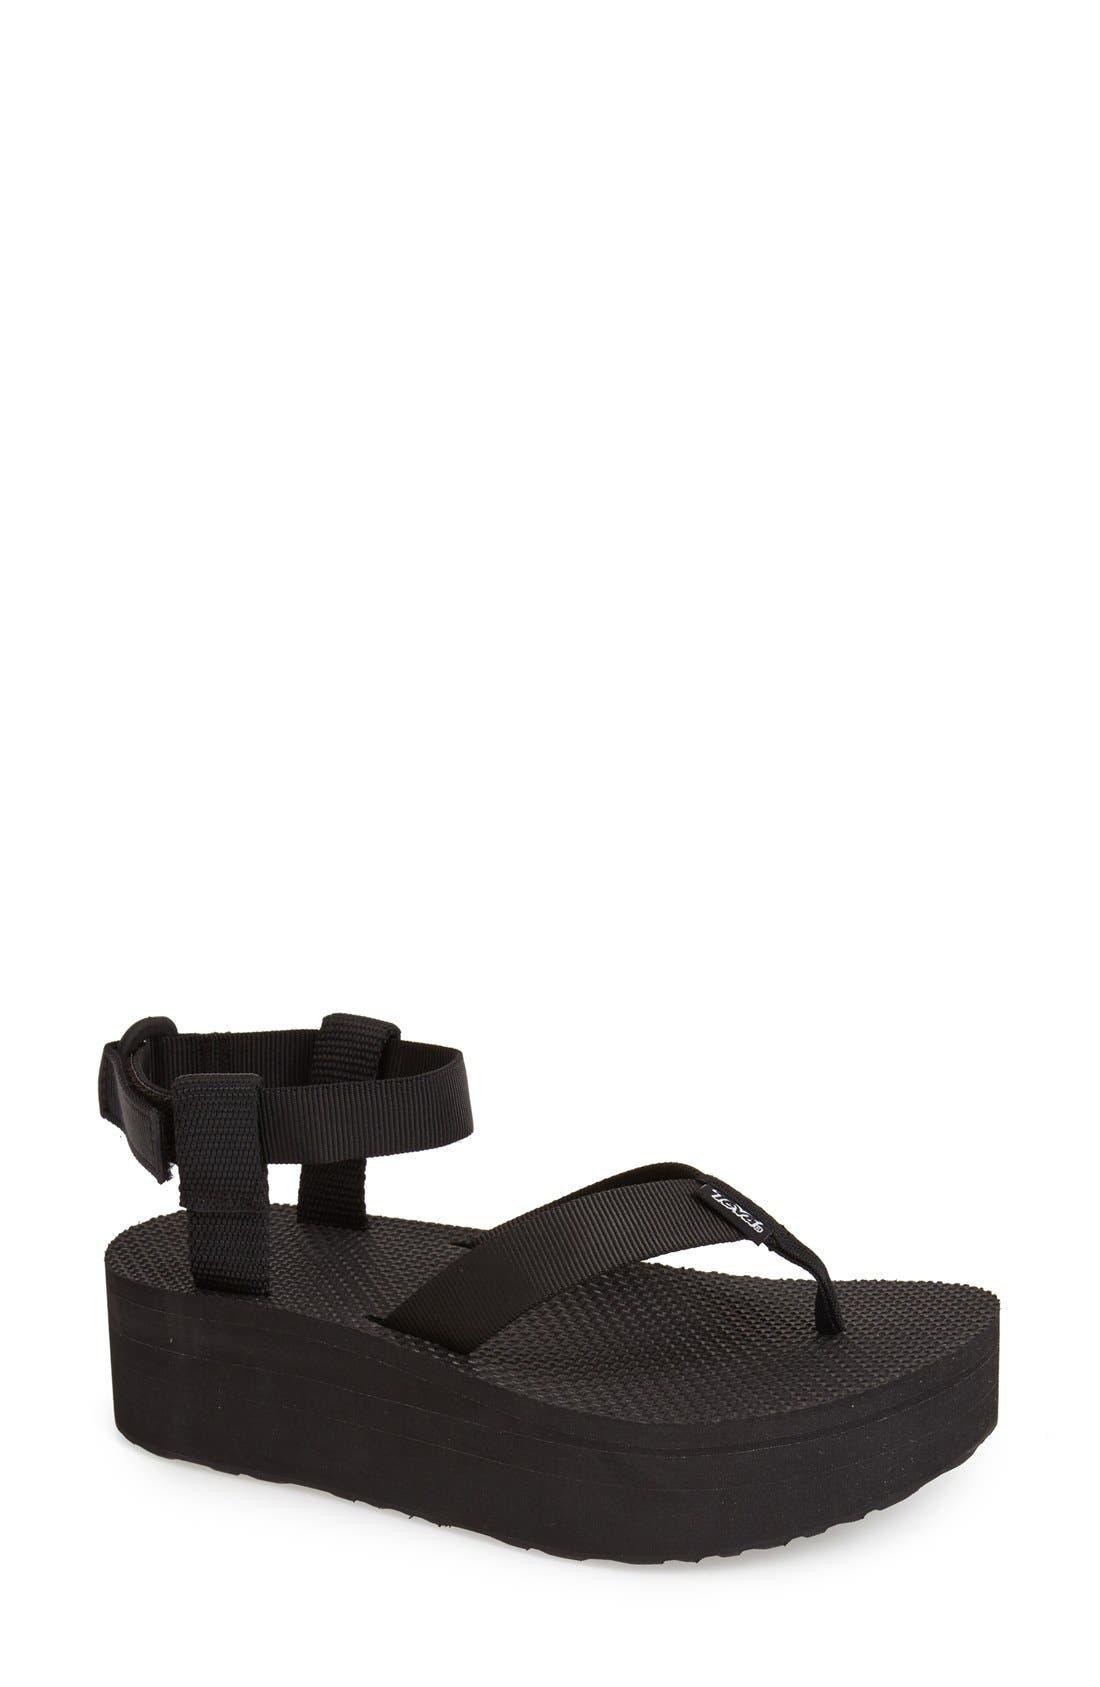 TEVA,                             'Original' Flatform Sandal,                             Main thumbnail 1, color,                             001